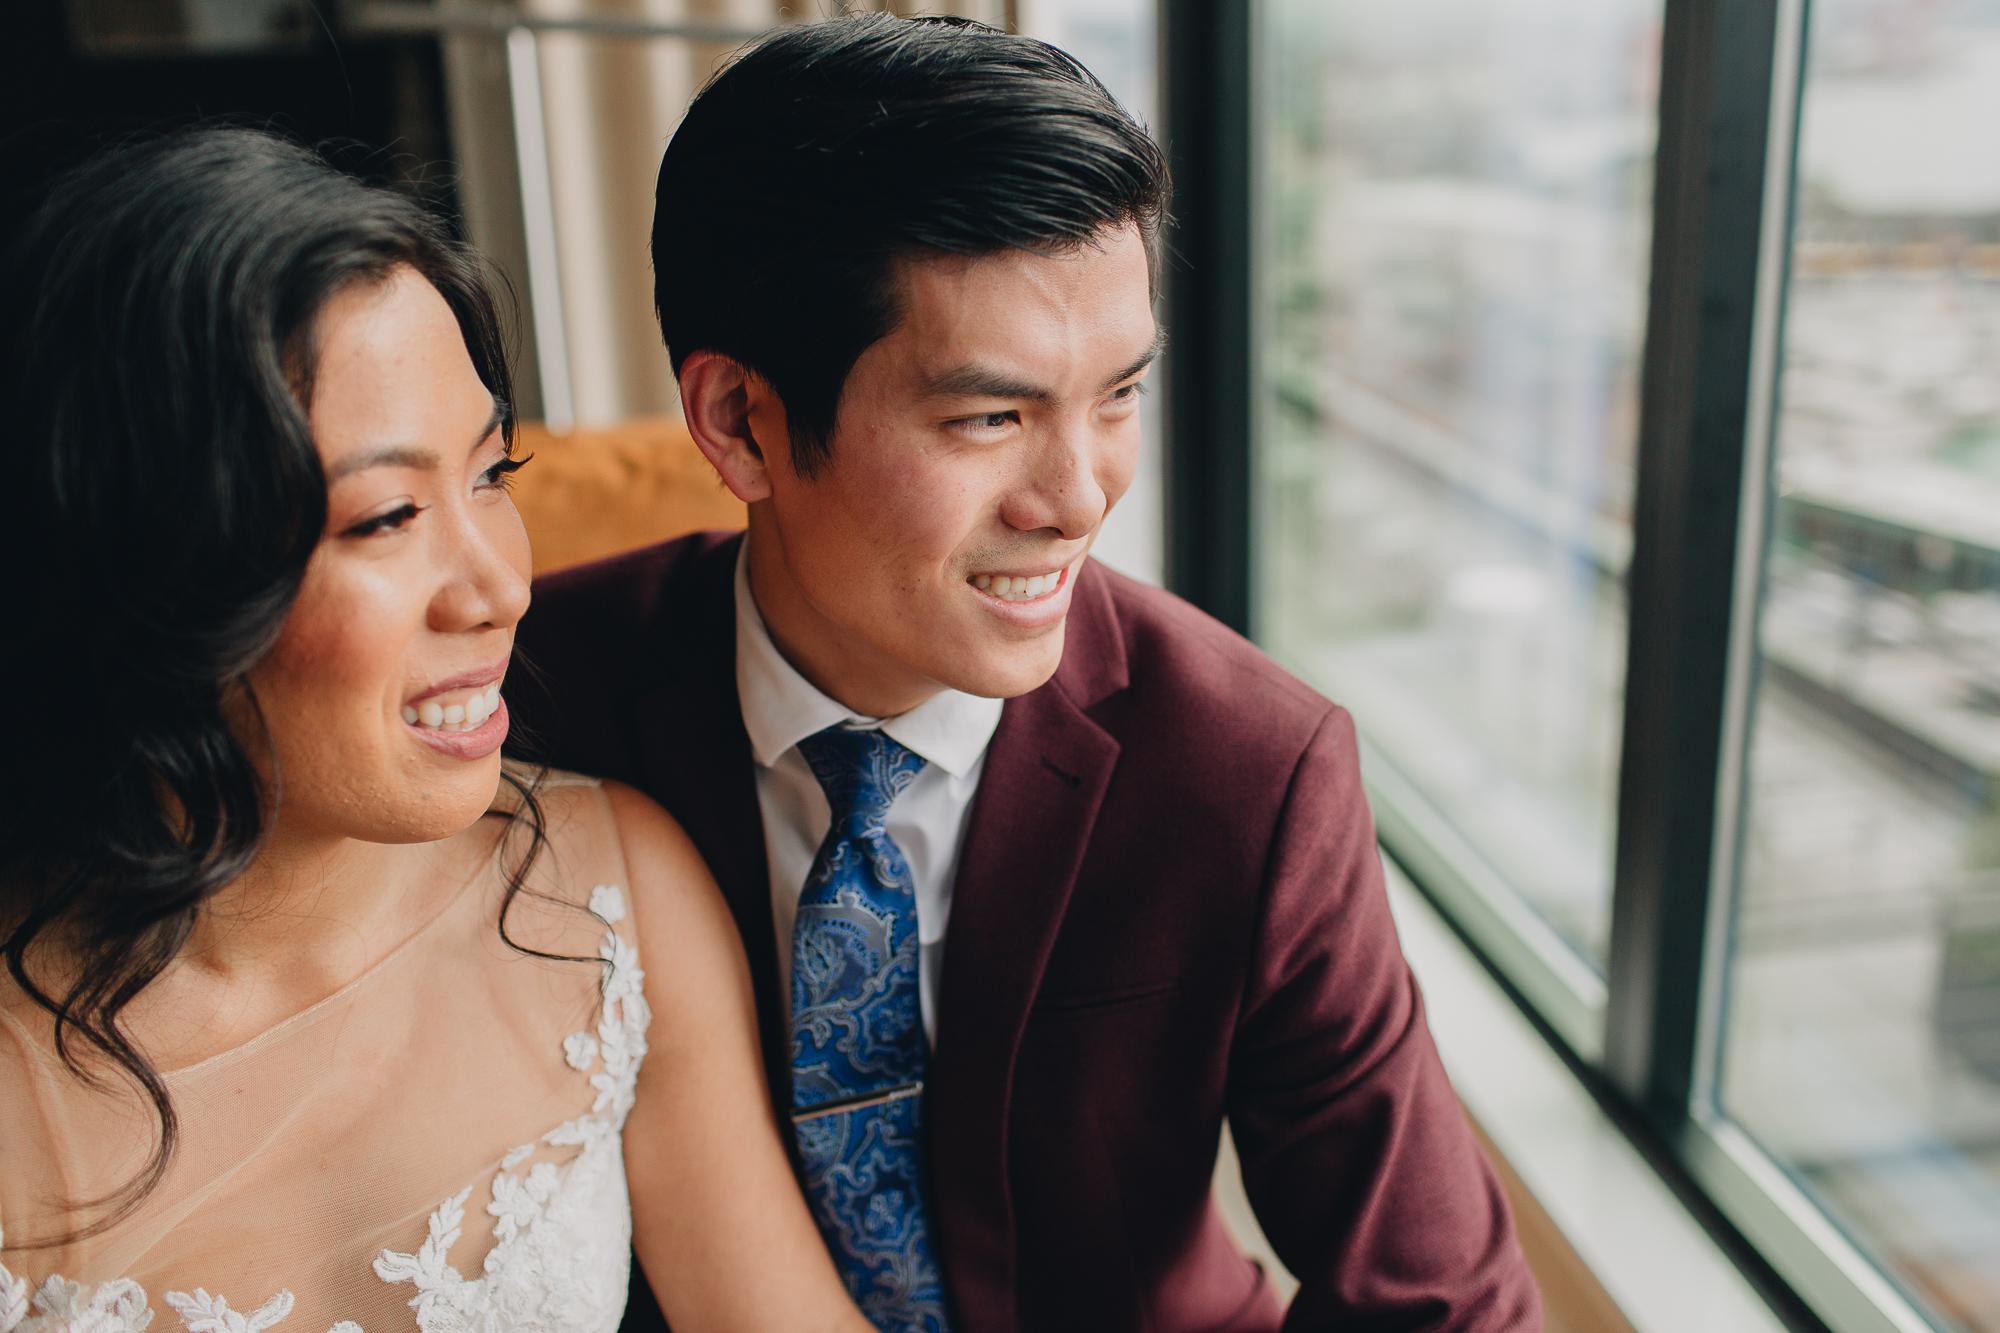 Seattle courthouse wedding photos kristawelch25.jpg